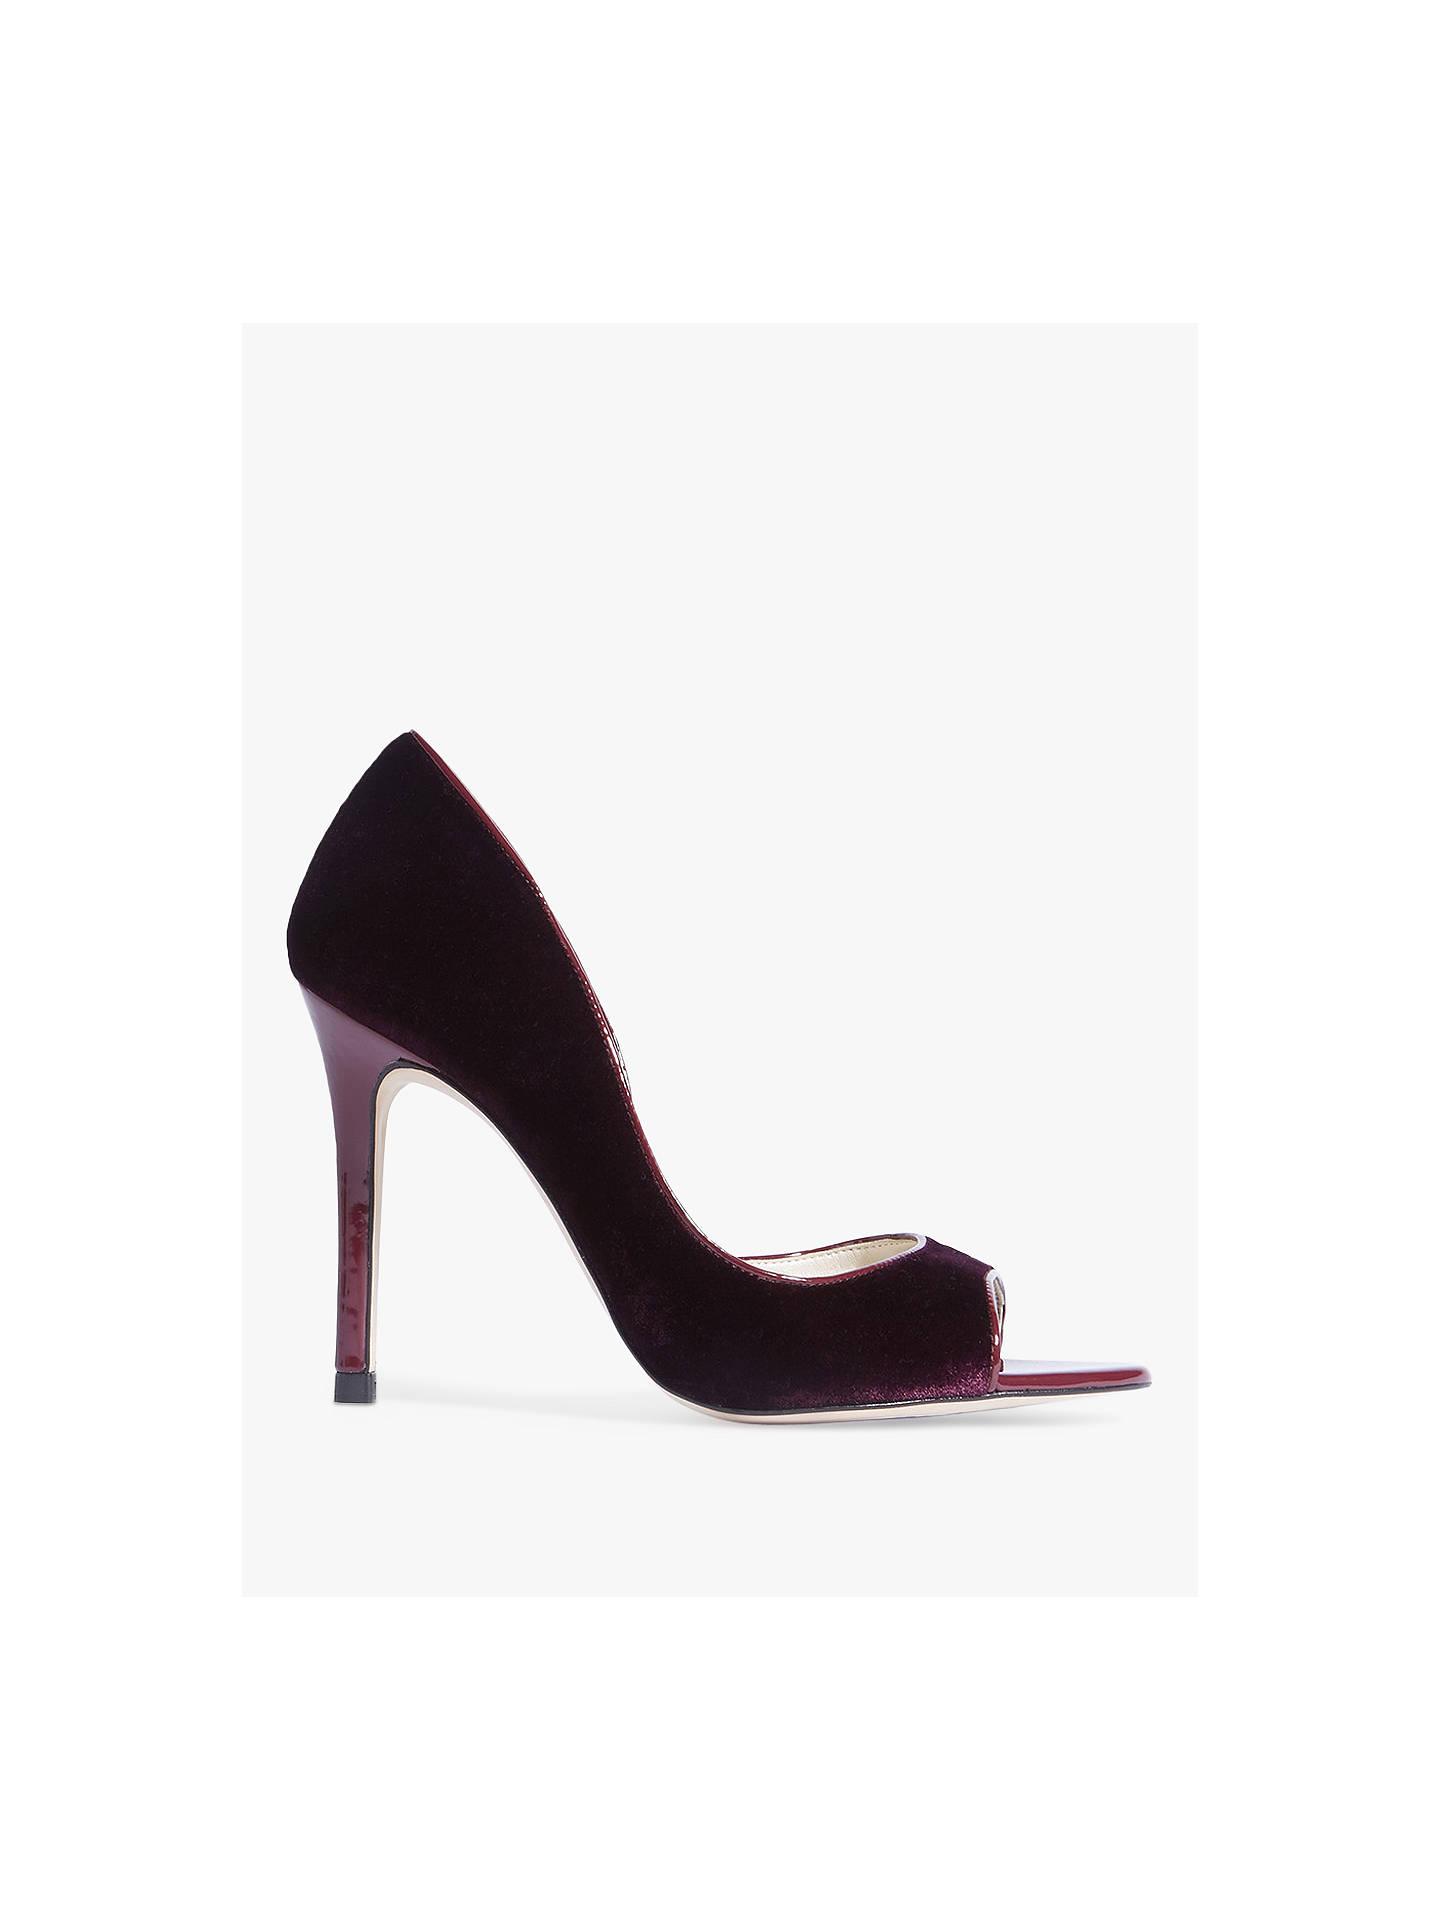 61462f8b297 Karen Millen Stiletto Peep Toe Court Shoes, Purple at John Lewis ...